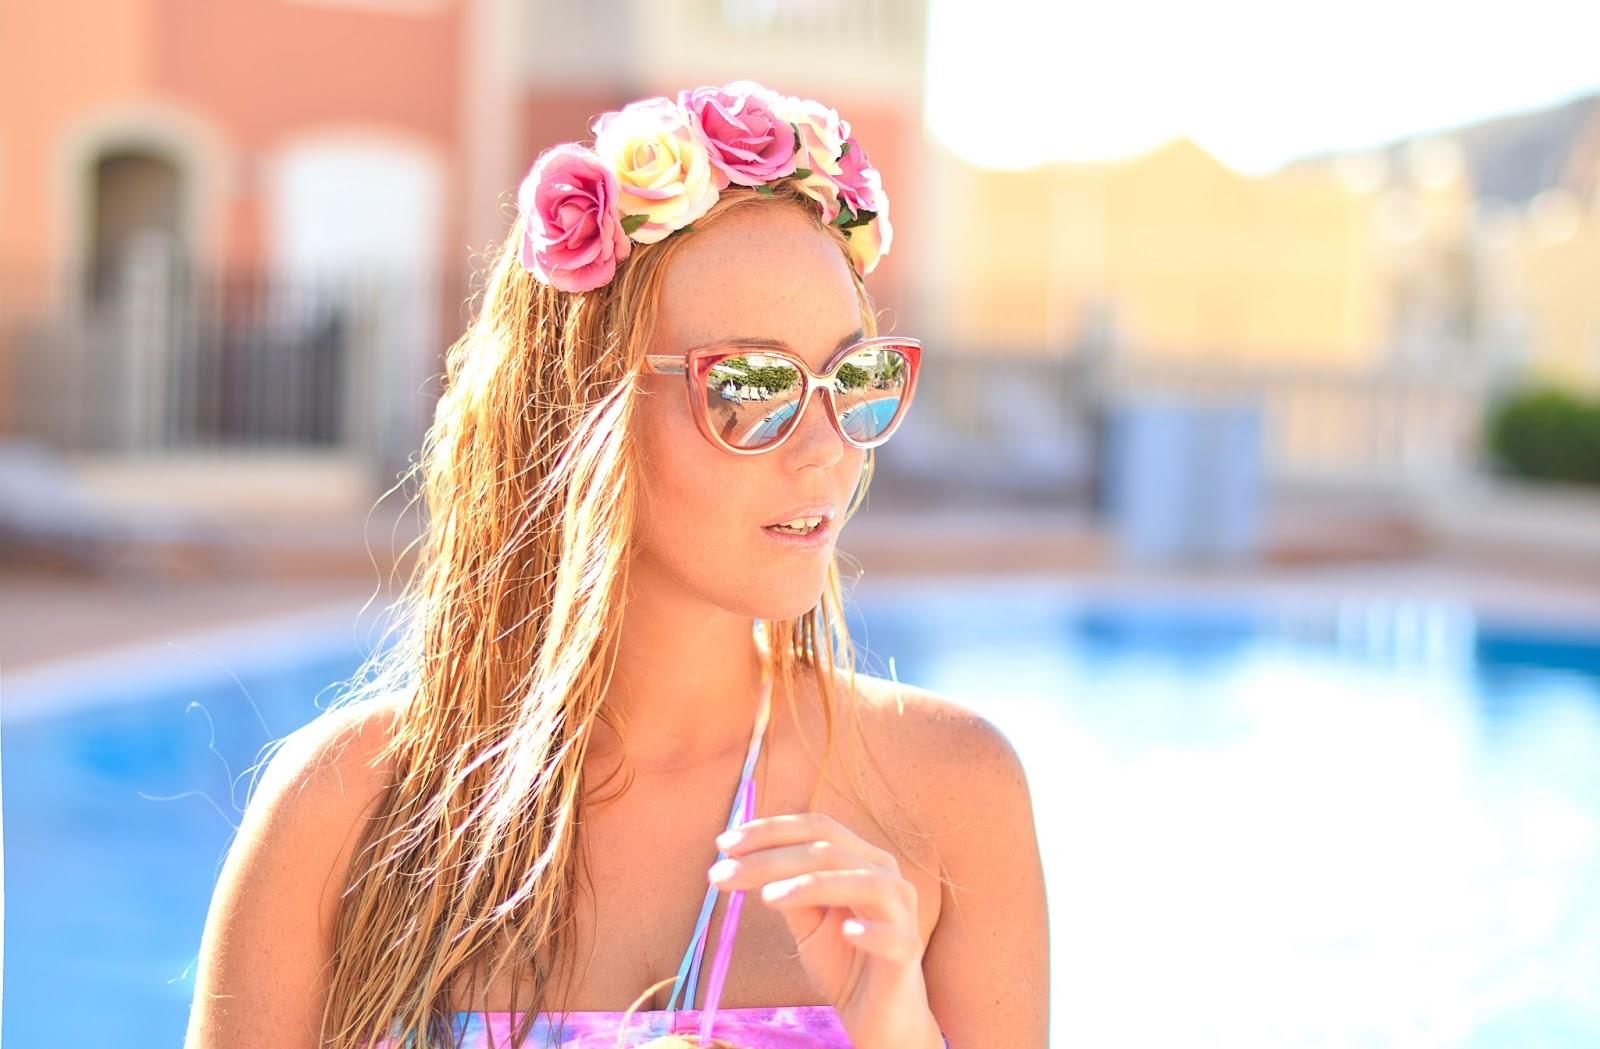 nery hdez, amiclubwear, blondedege, primark opticalh, summer look